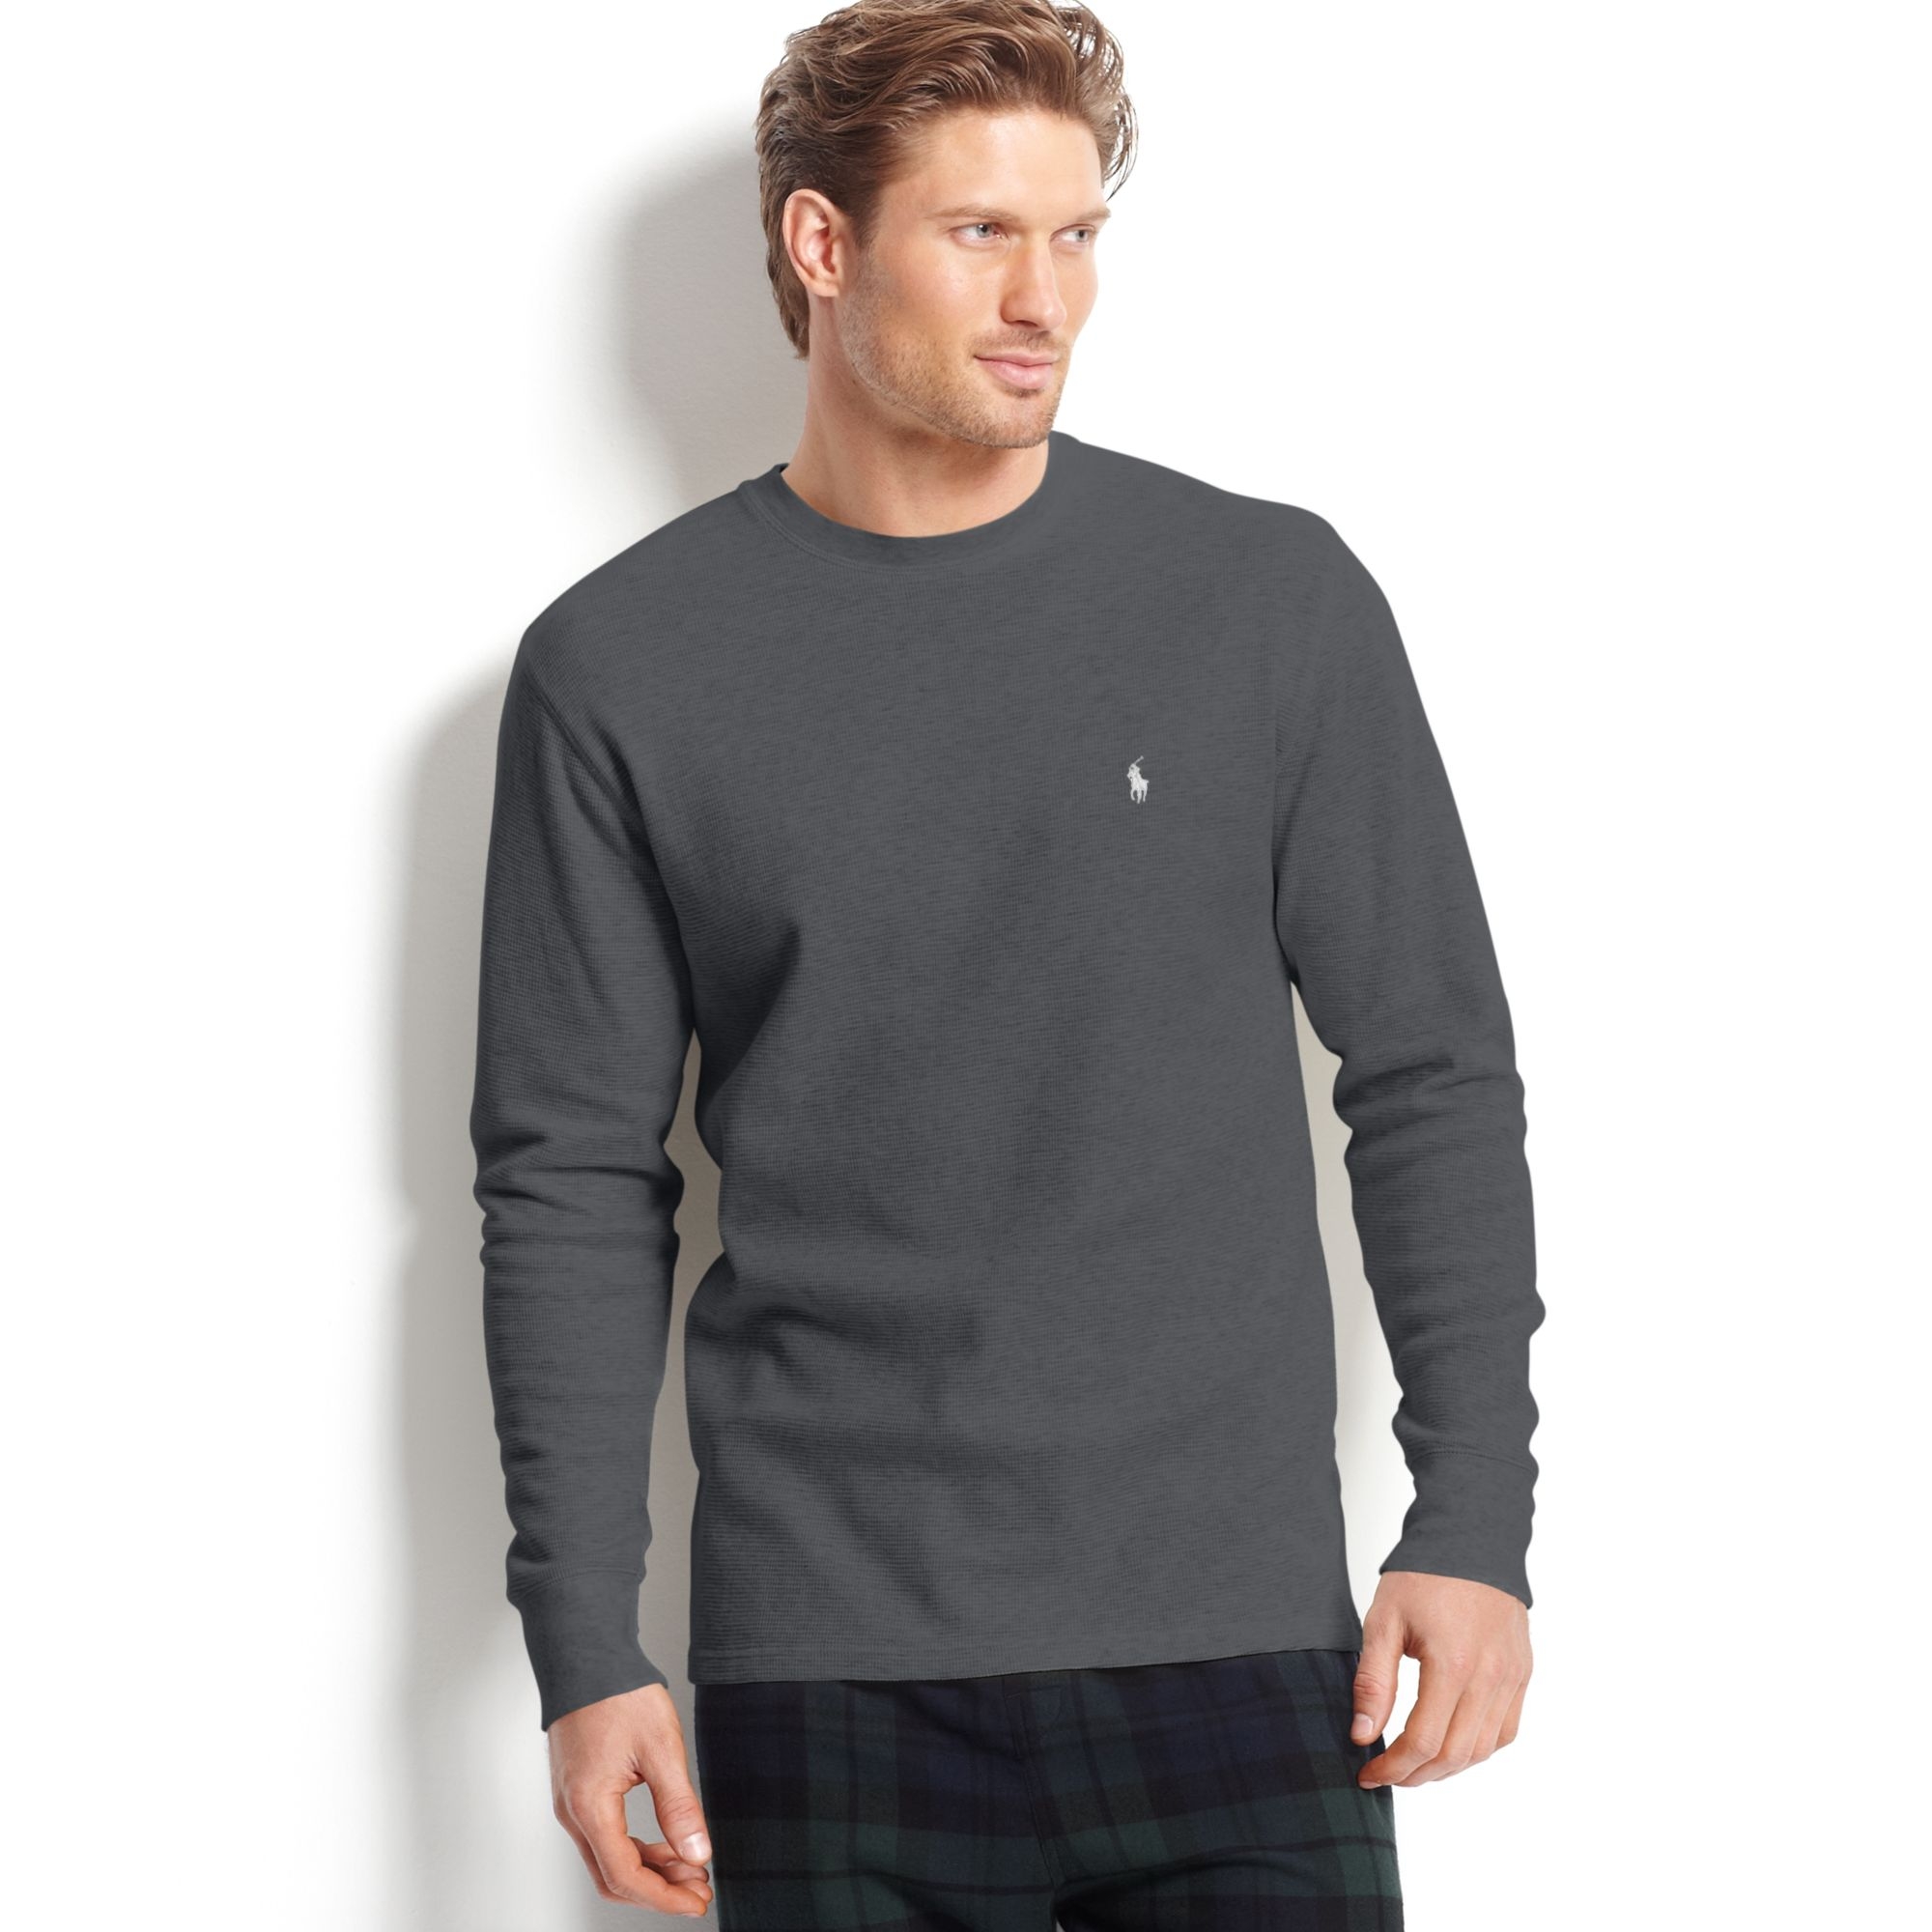 78699671 Ralph Lauren Long Sleeve Crew Neck Waffleknit Thermal Tshirt in Gray ...